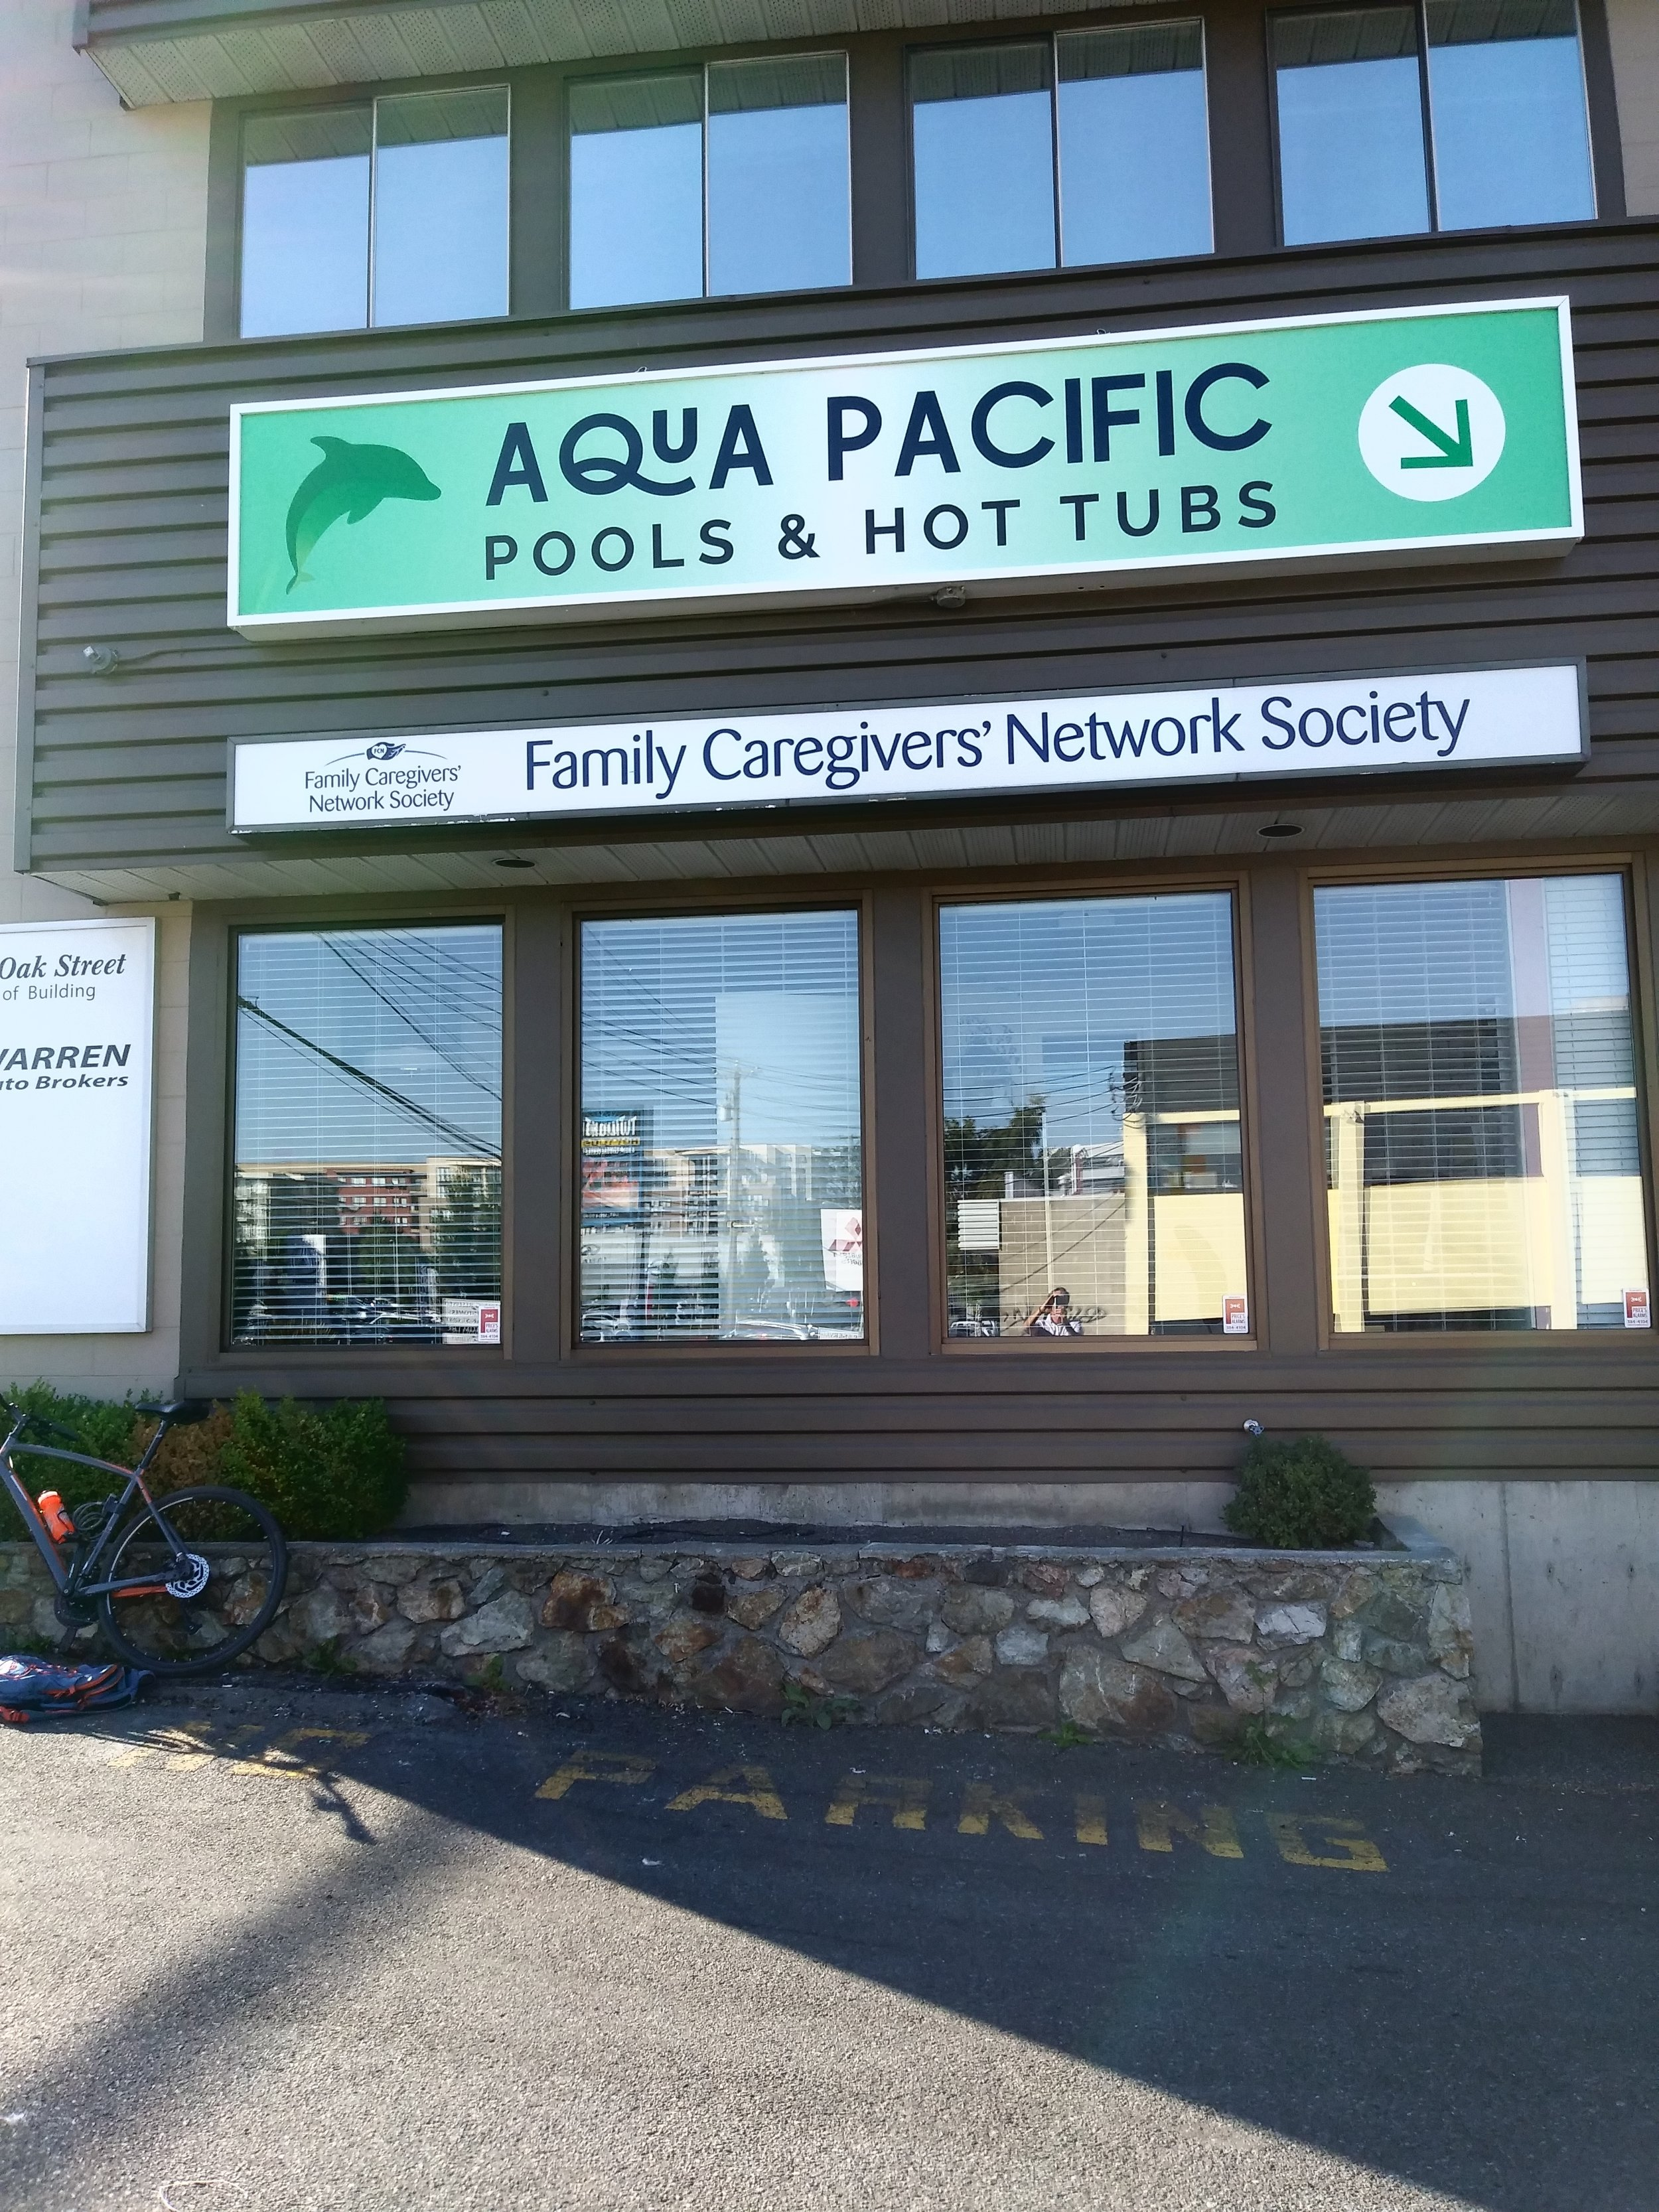 Aqua Pacific new signage